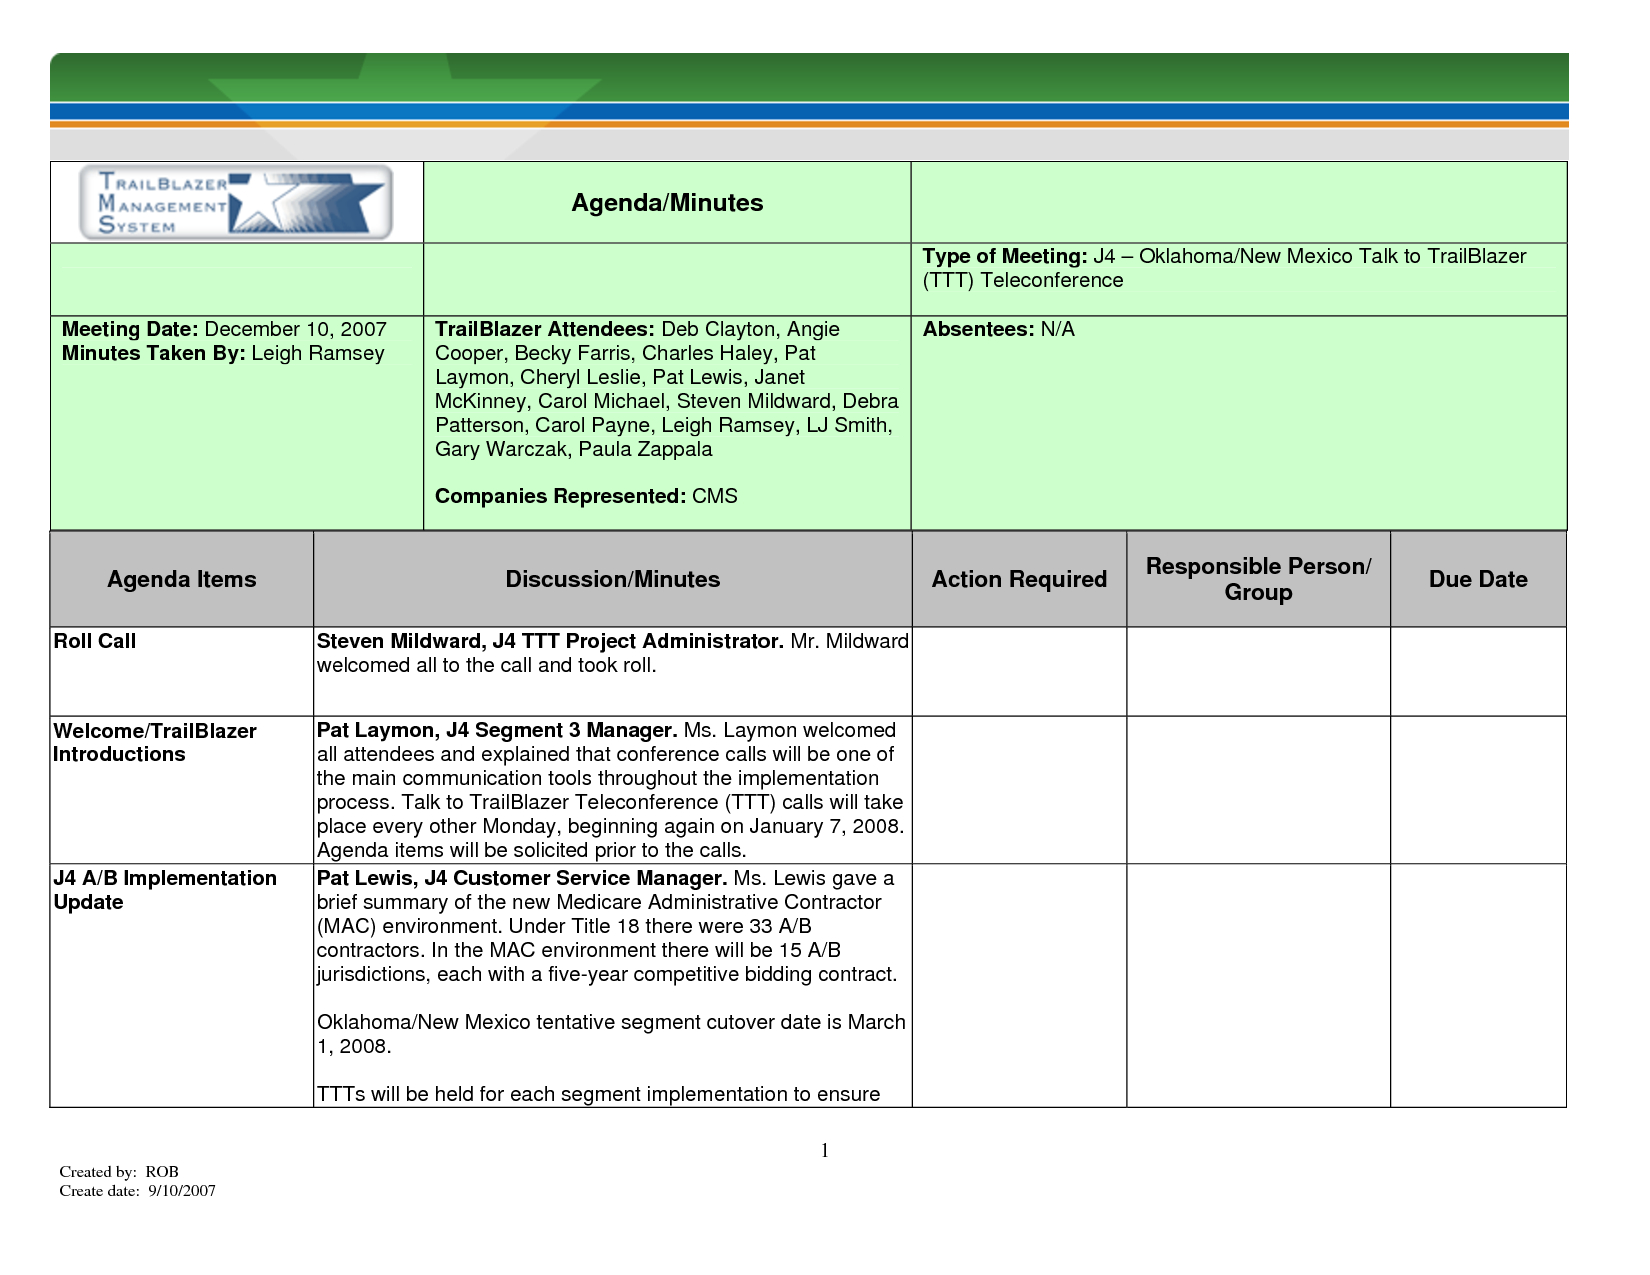 Printable Template Of Meeting Minutes | Meeting Minutes Template For - Meeting Minutes Template Free Printable